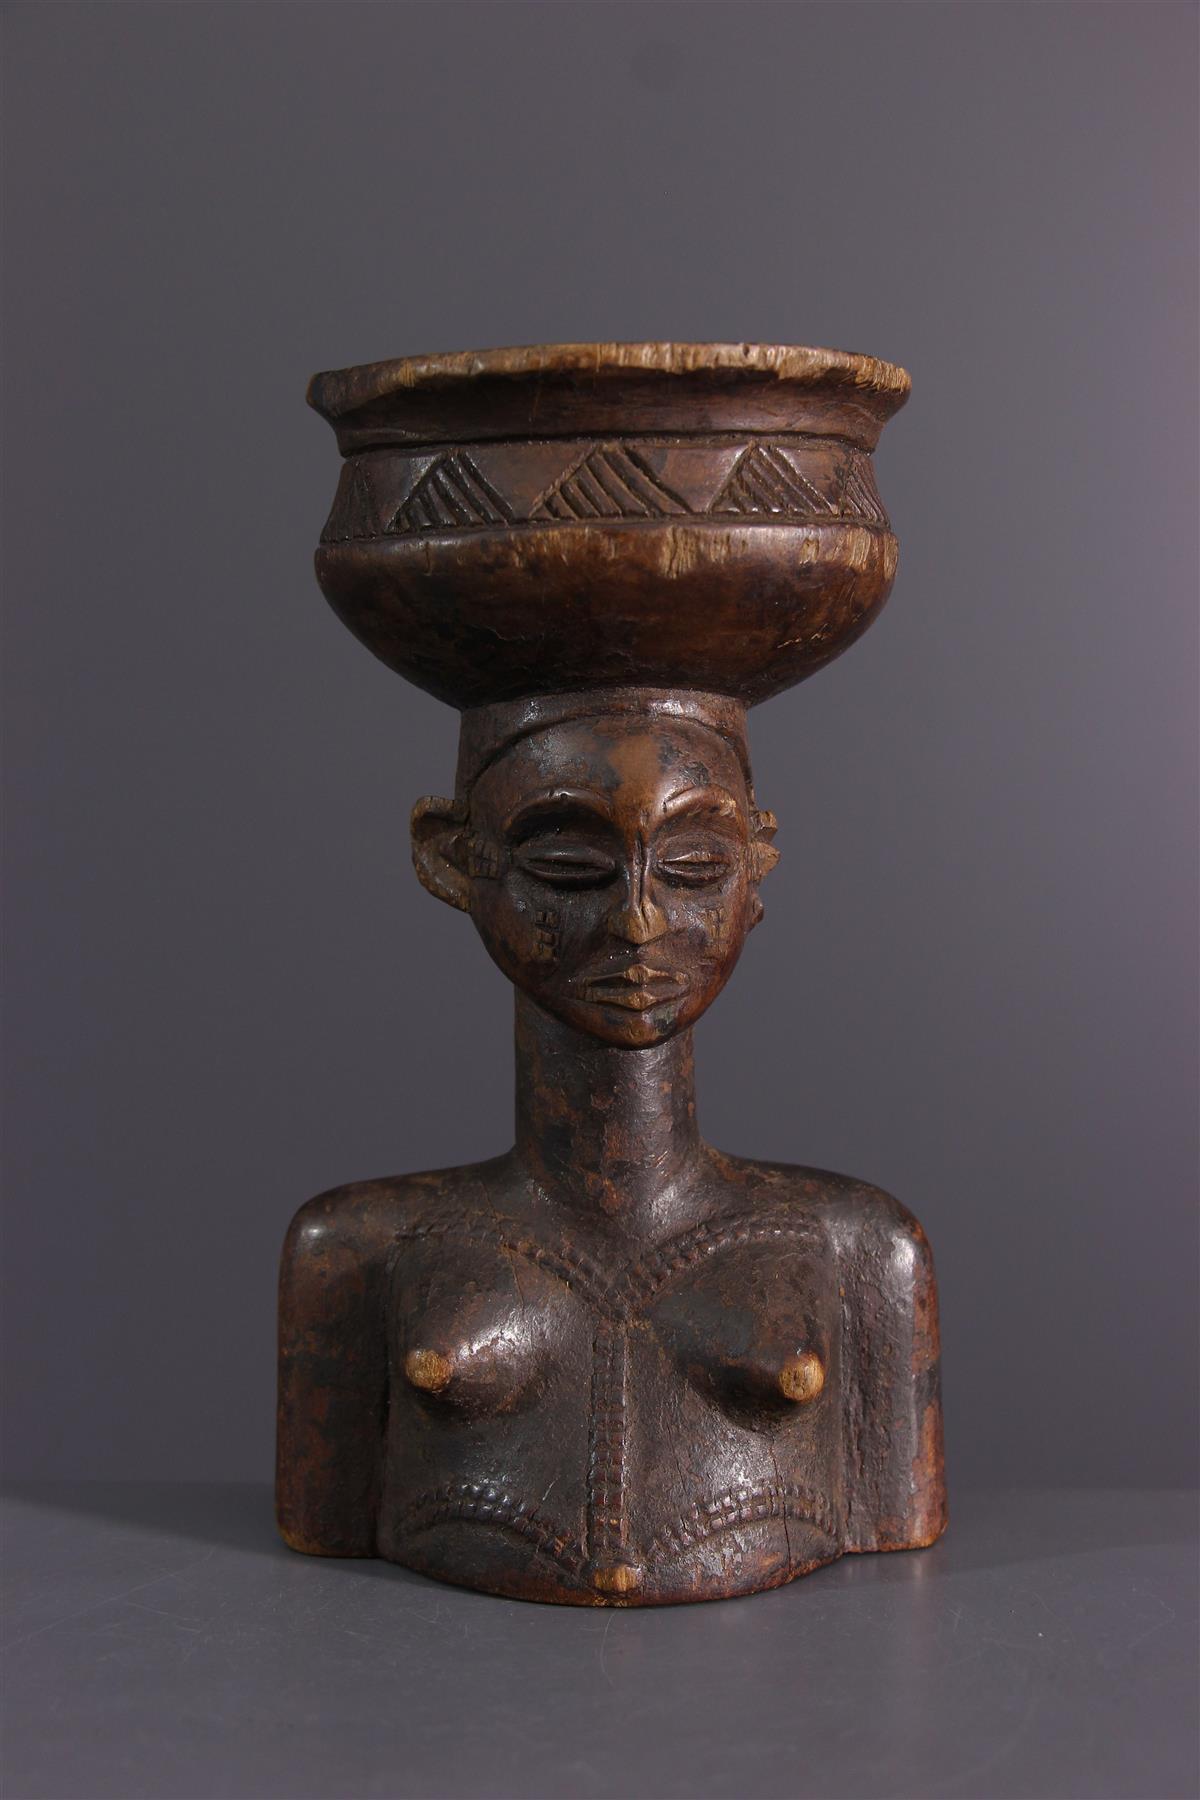 Tabwa cup - African art